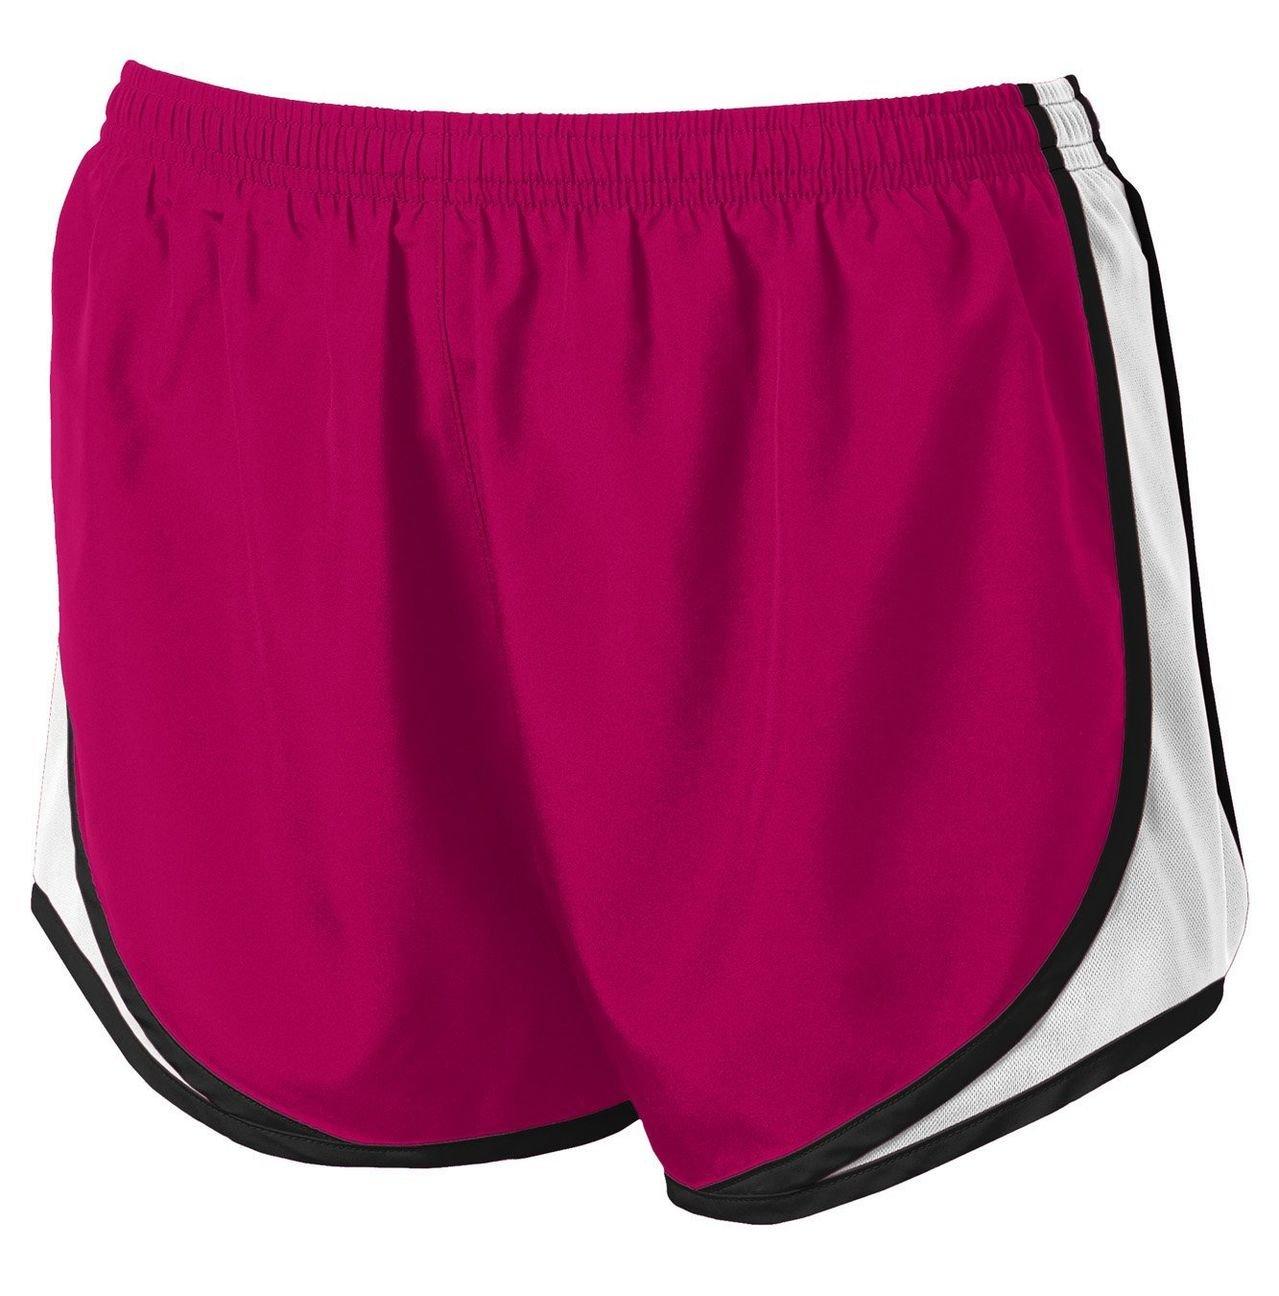 Clothe Co. Ladies Moisture Wicking Sport Running Shorts, Pink Raspberry/White/Black, XS